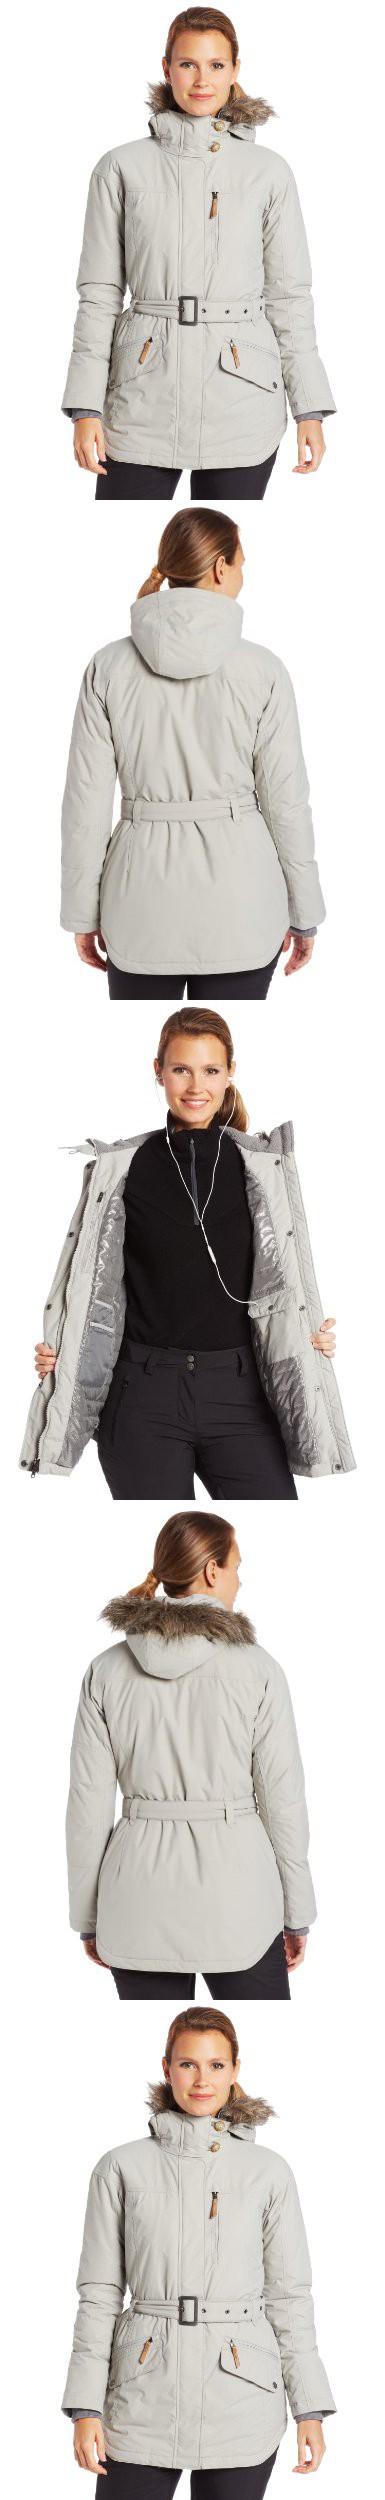 5e868b4834d Columbia Women's Carson Pass II Jacket, Flint Grey, Large   Down ...